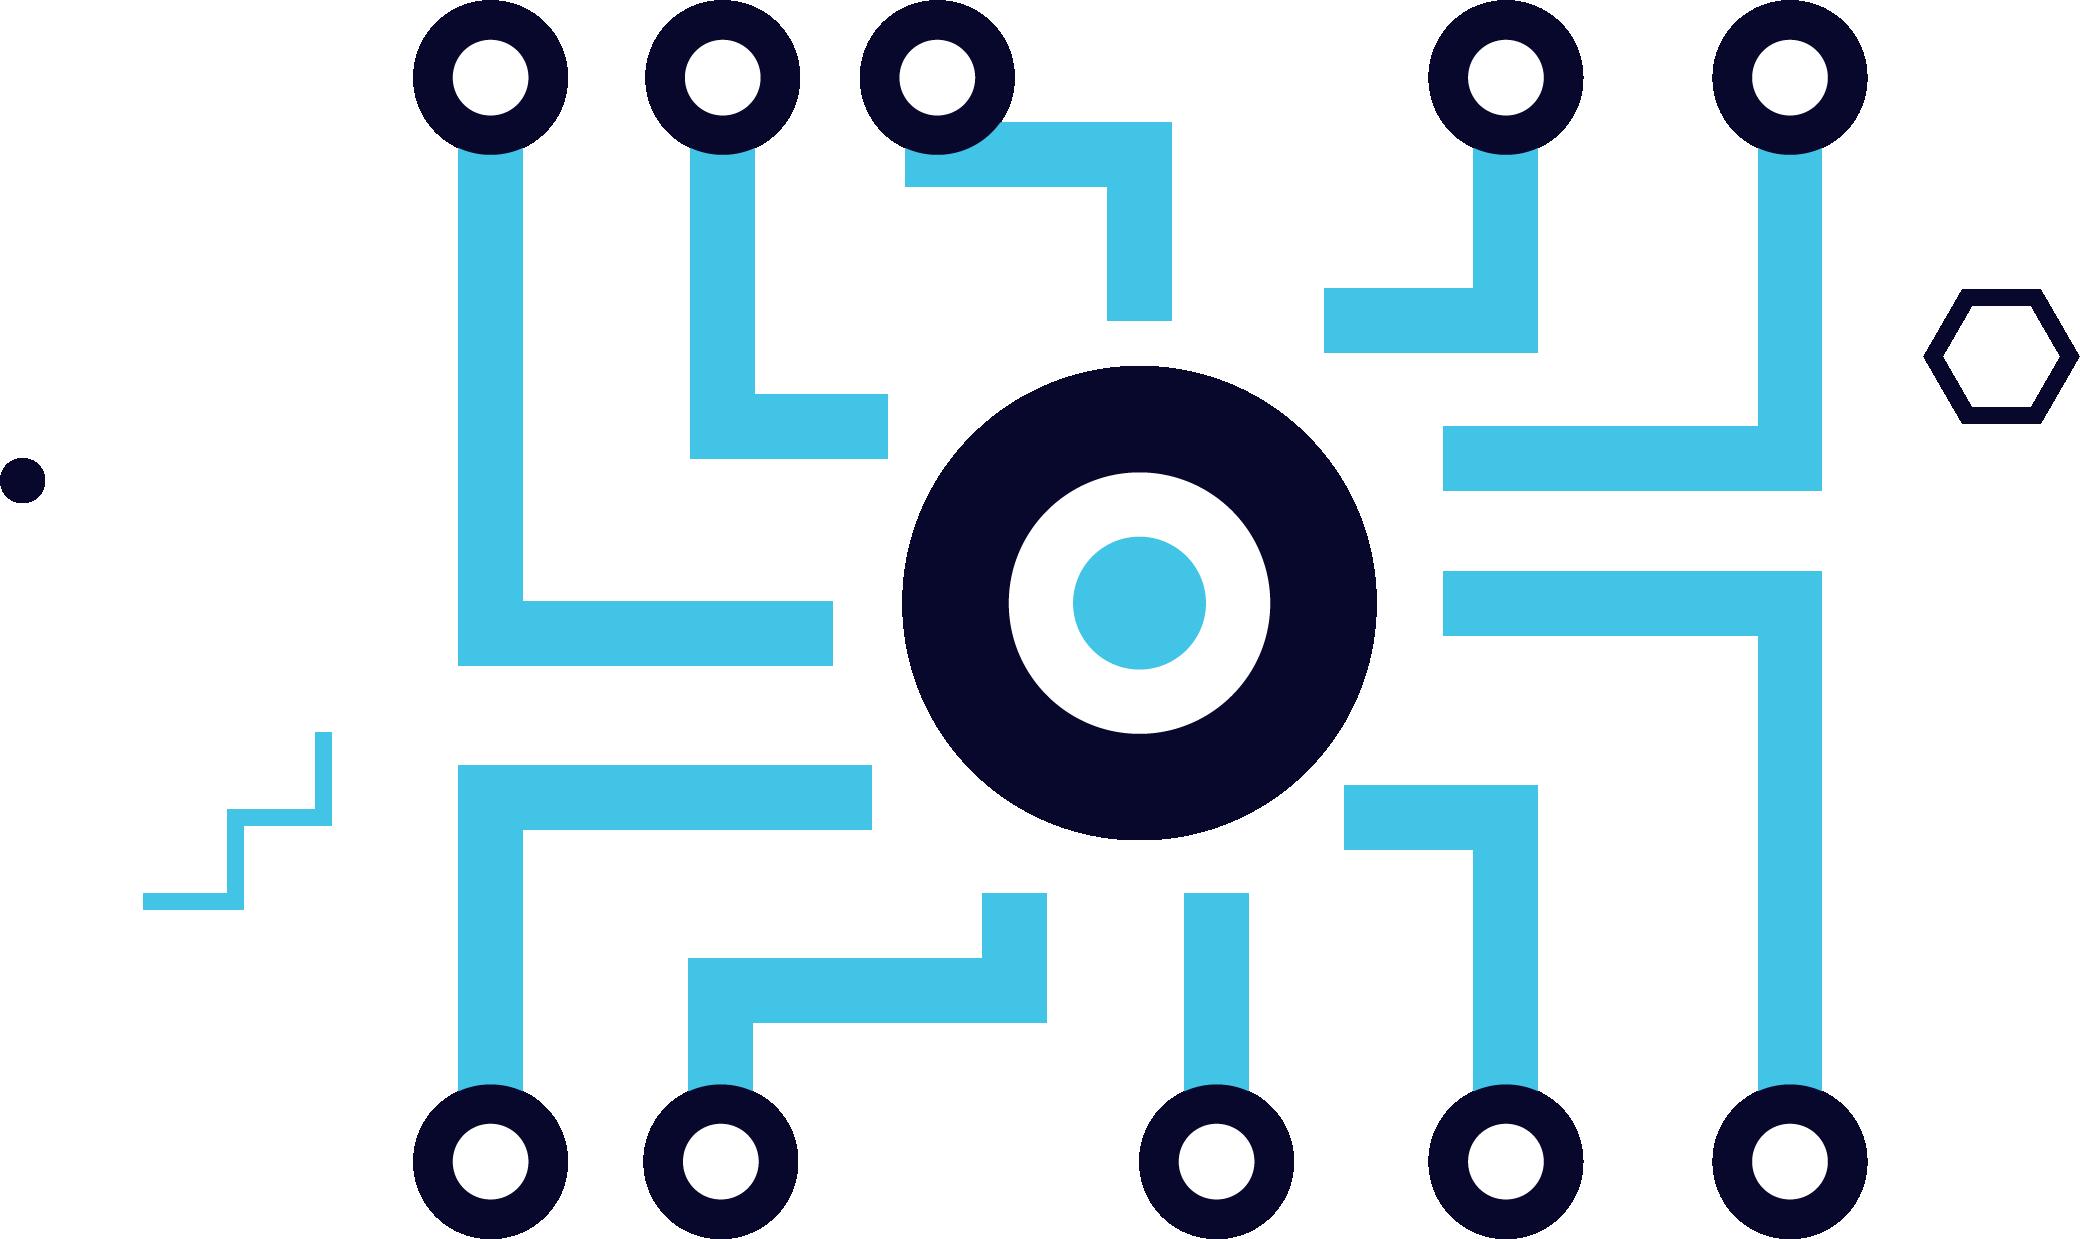 distributediconset